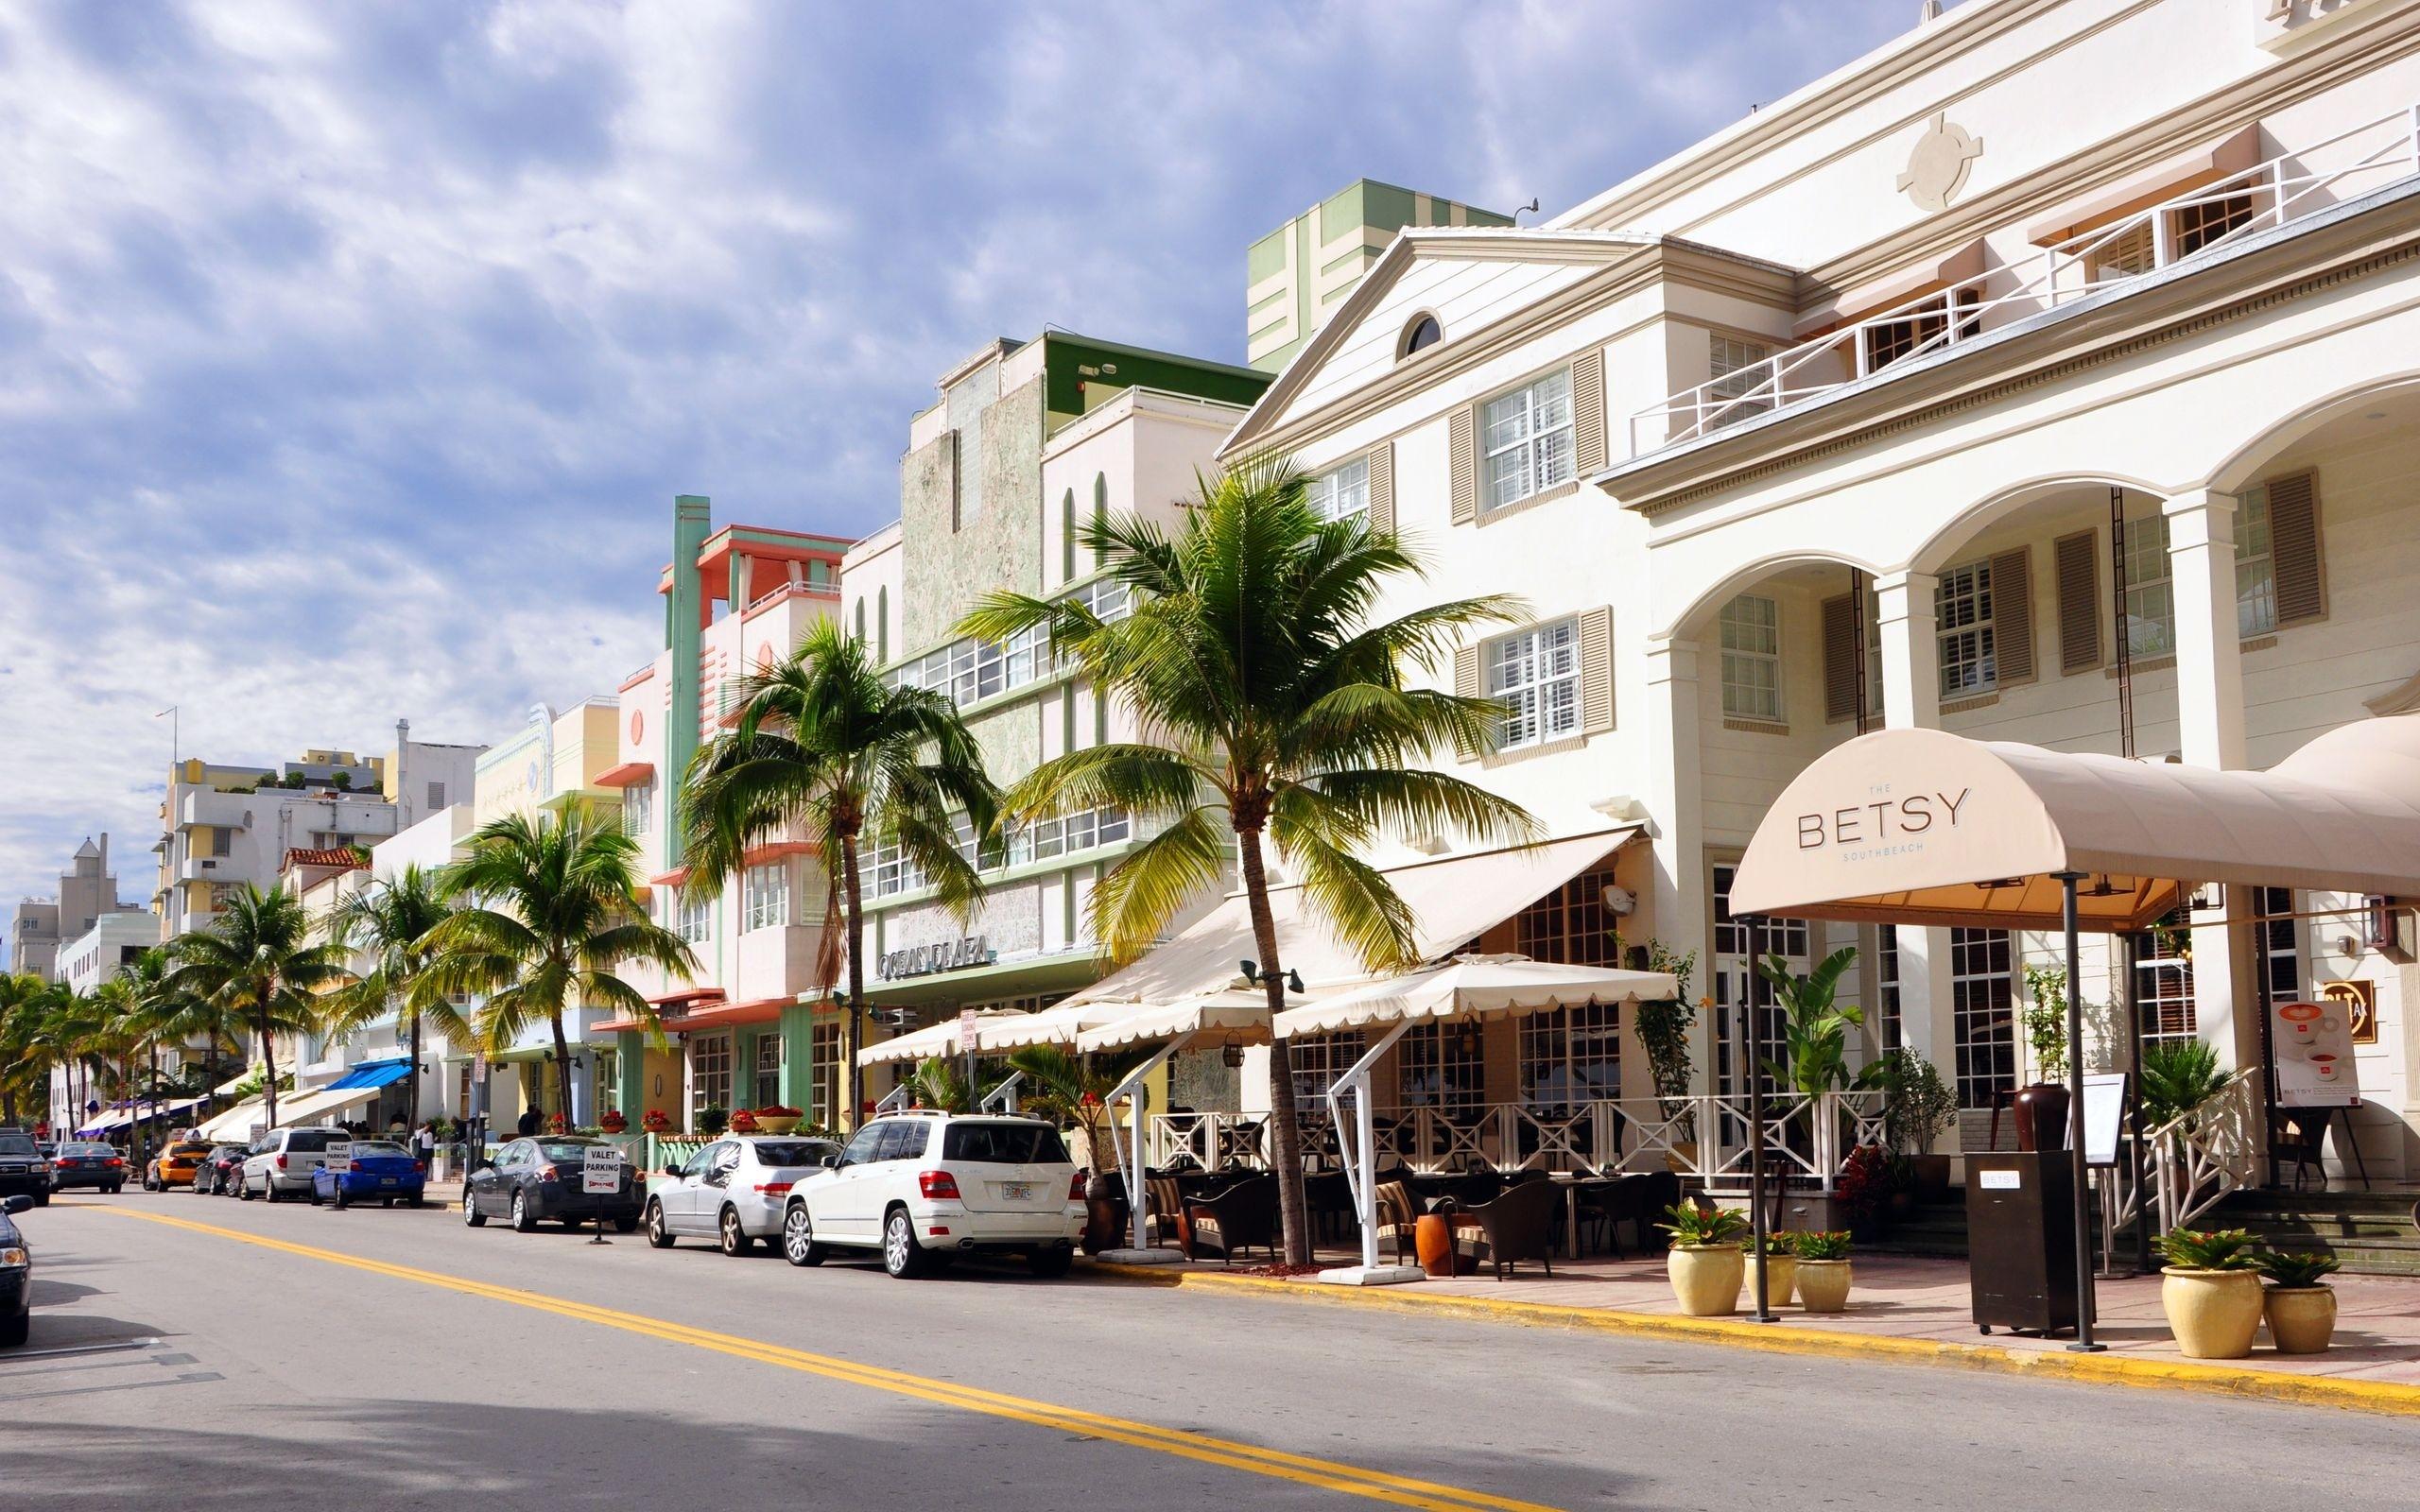 Street cafe in Miami